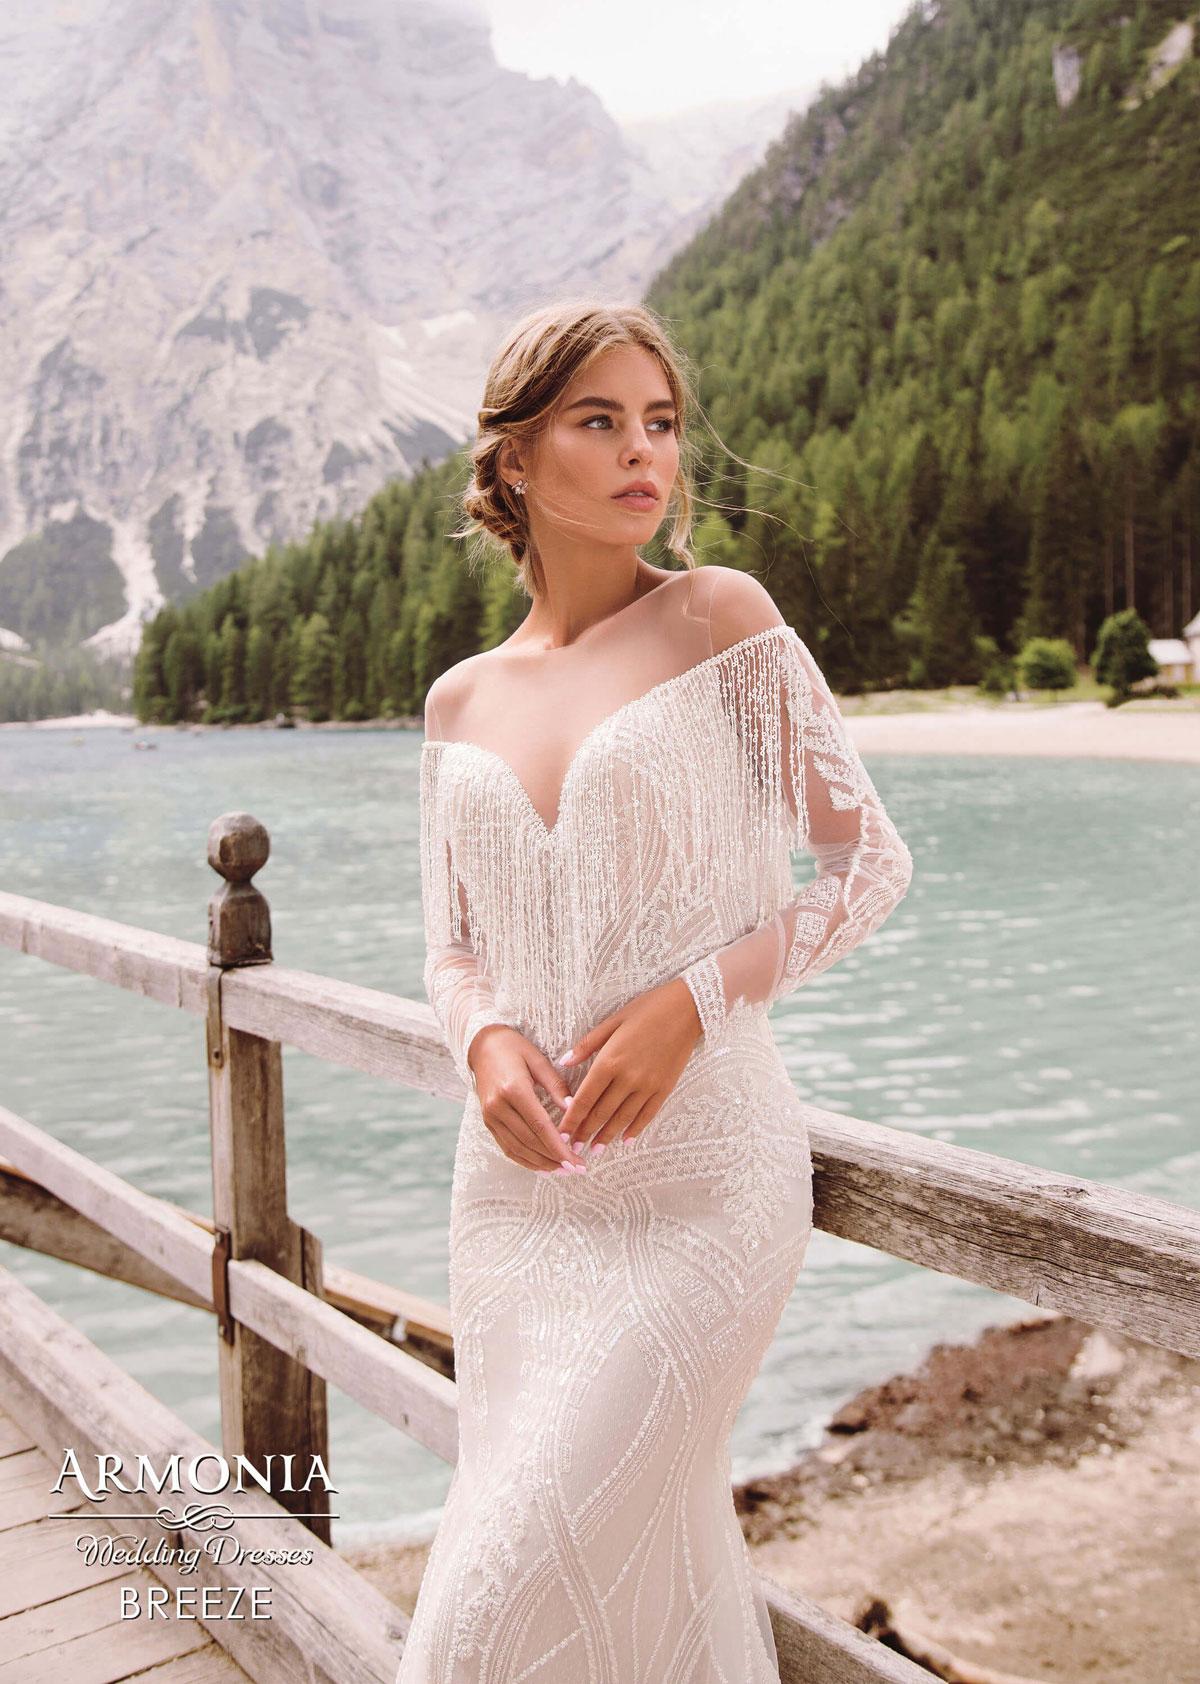 Cвадебное платье Breeze